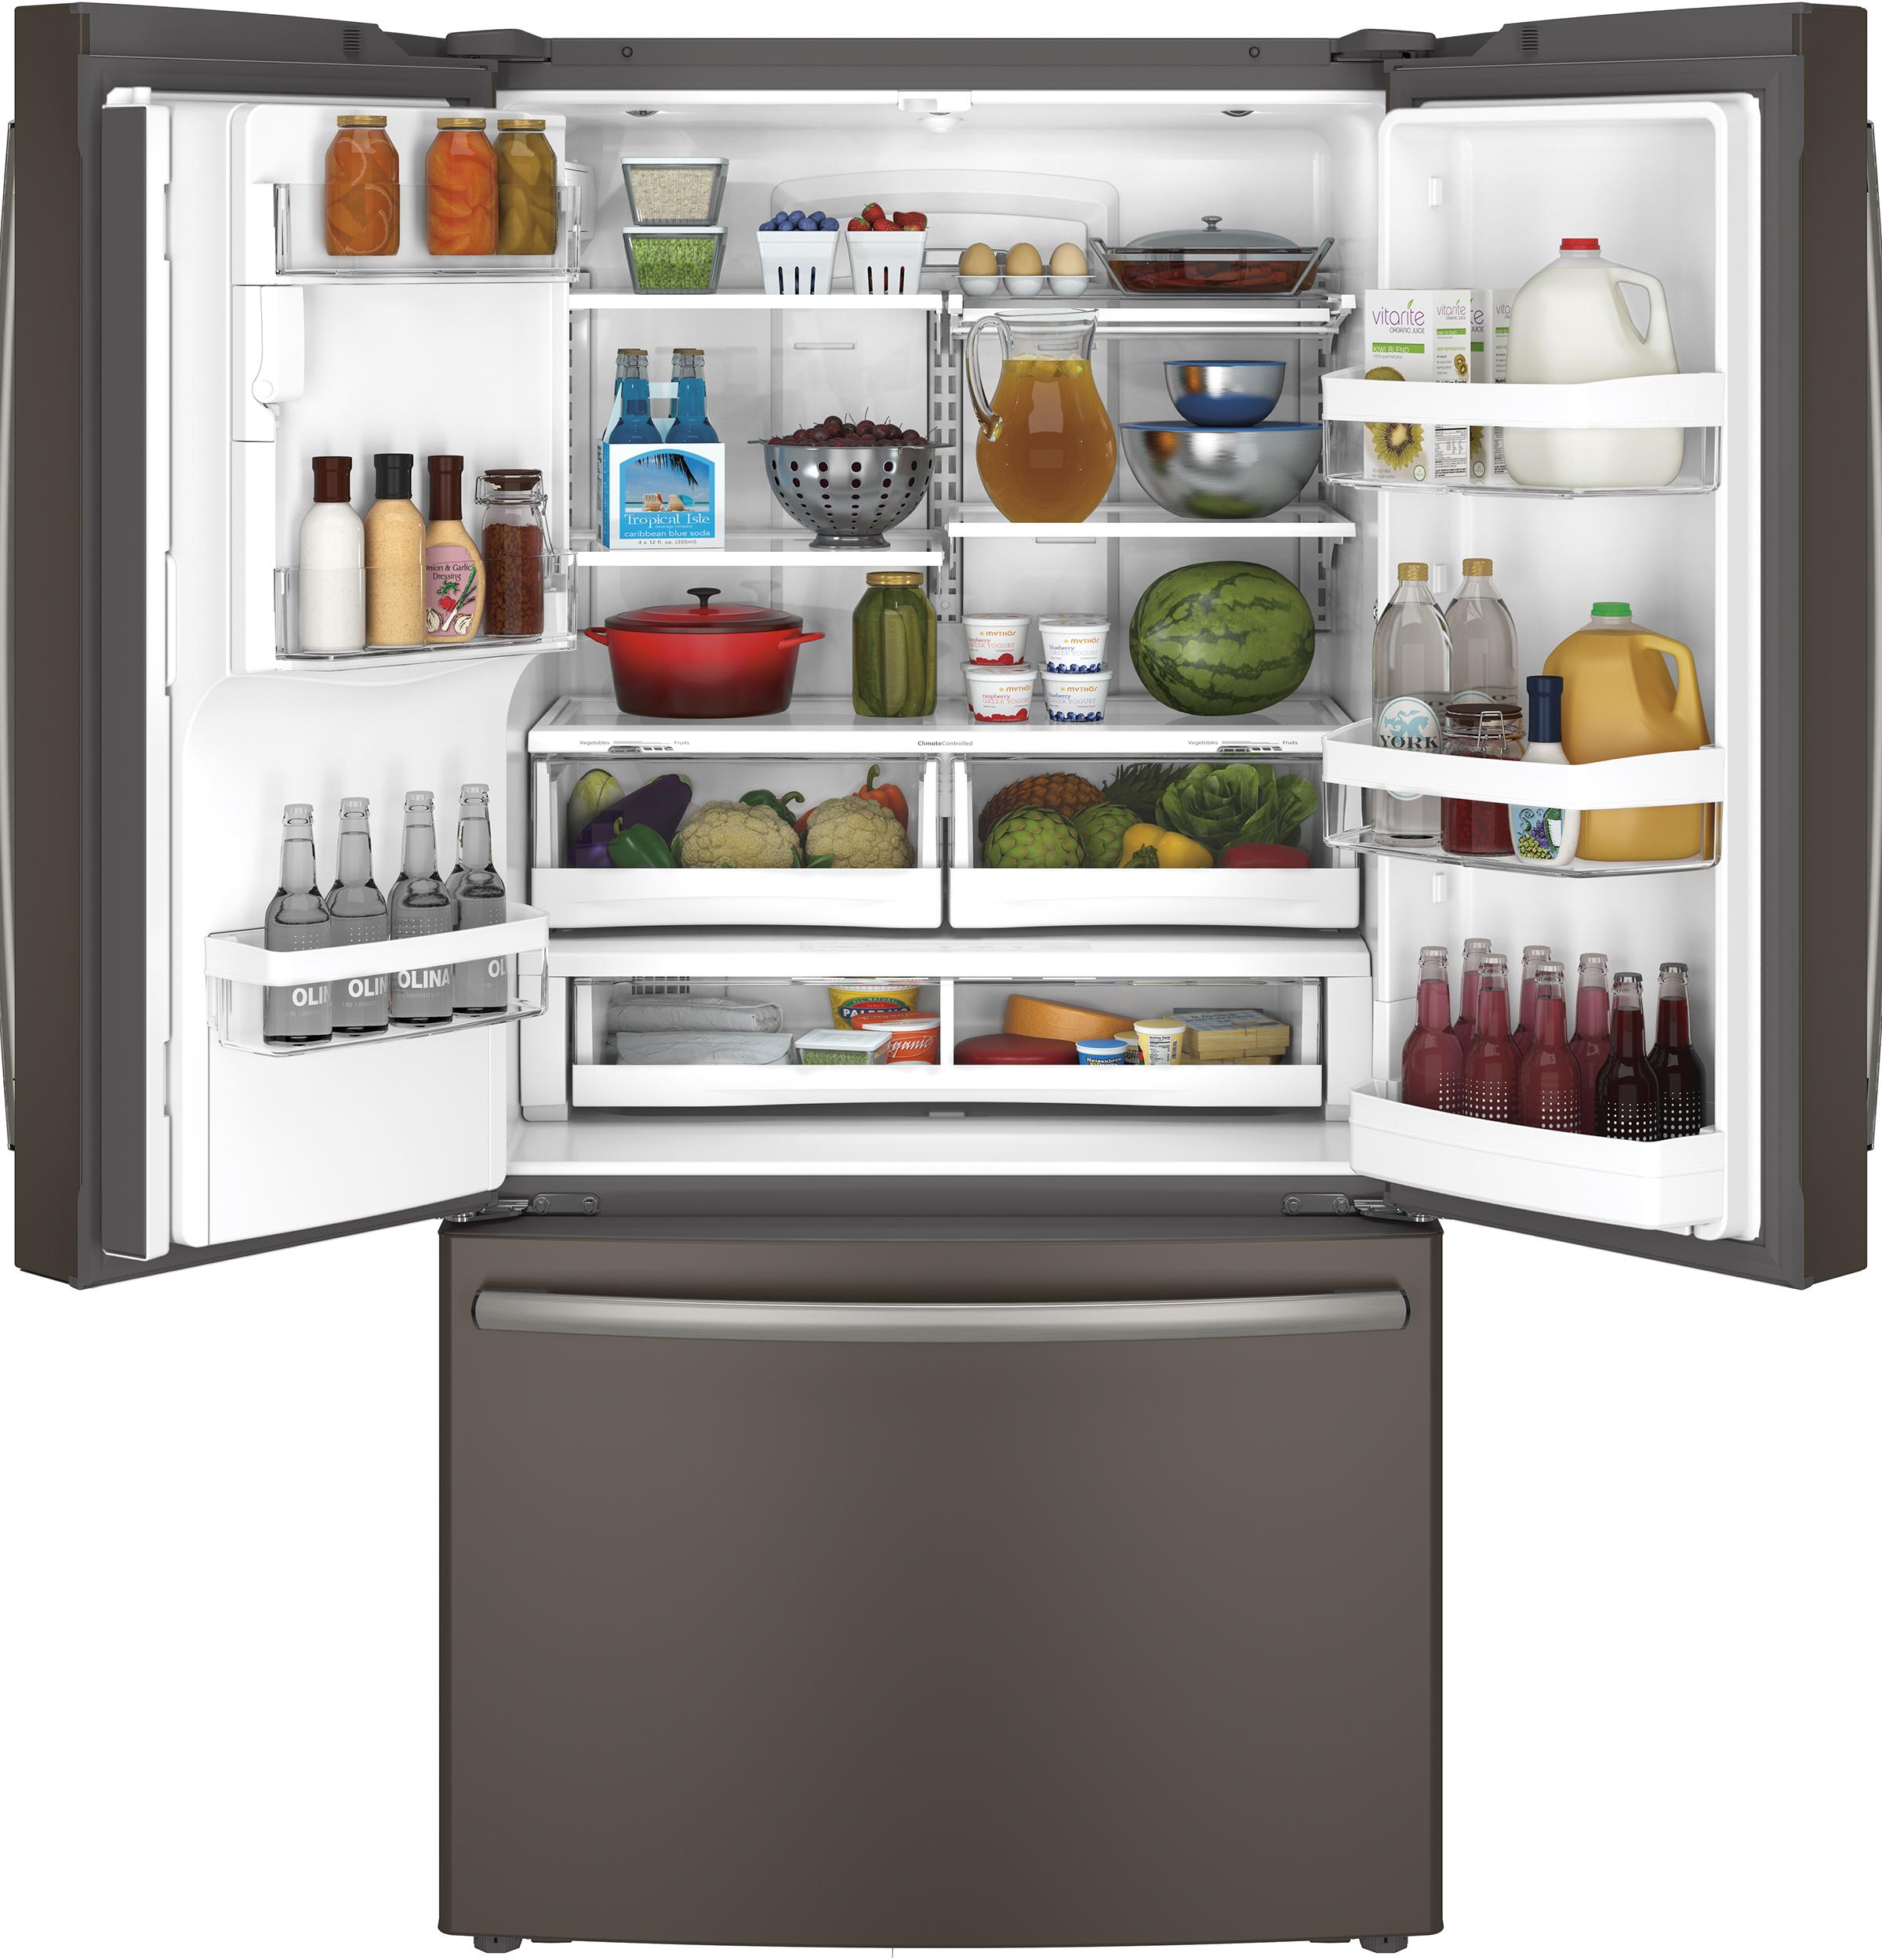 GE Appliances GYE22KMHES 22.1 cu. ft. Counter-Depth French-Door Refrigerator - Slate